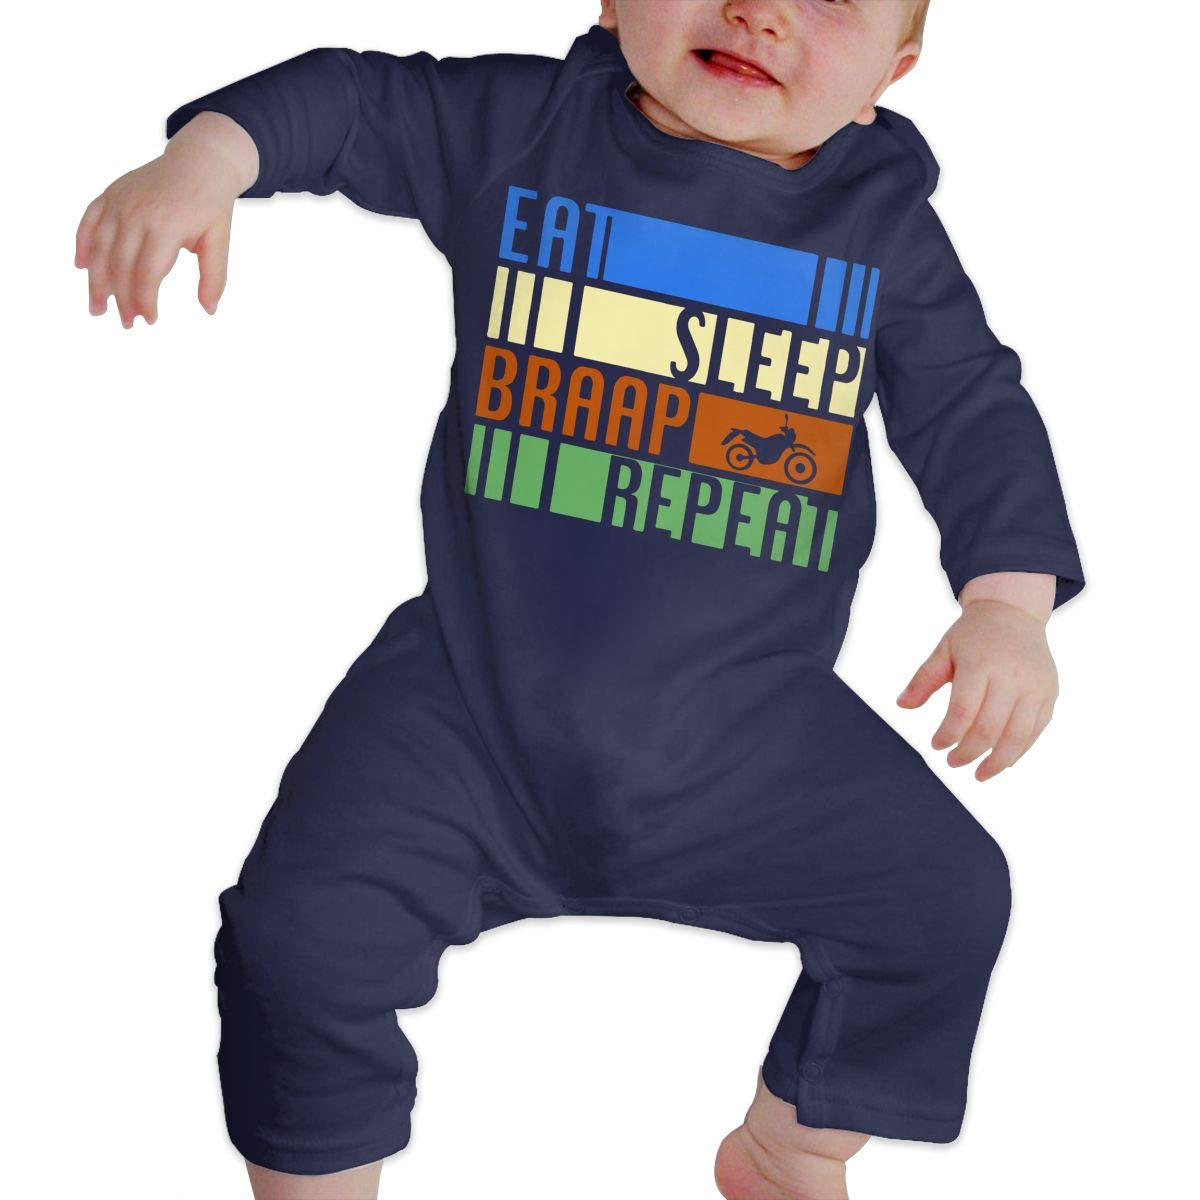 Mri-le1 Baby Boy Girl Jumpsuit Retro Eat Sleep Braap Repeat Motocross Kid Pajamas